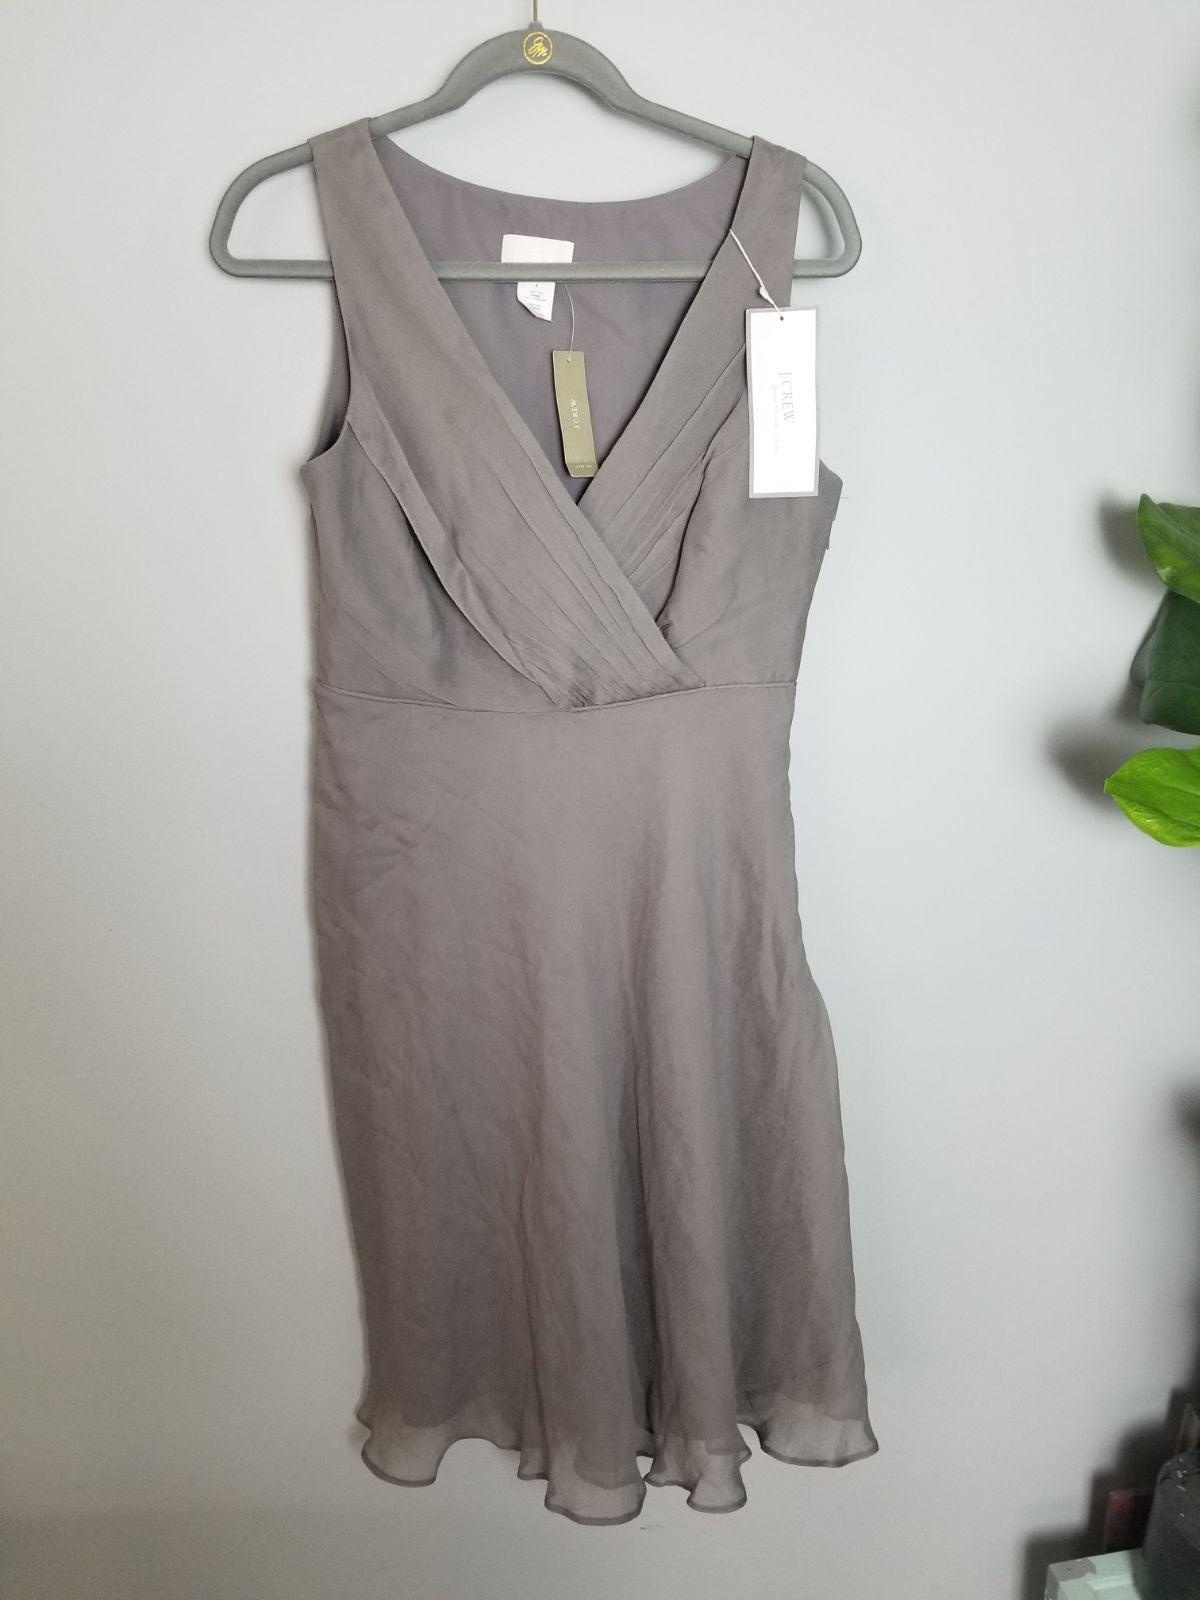 j crew dress gray silk size 8